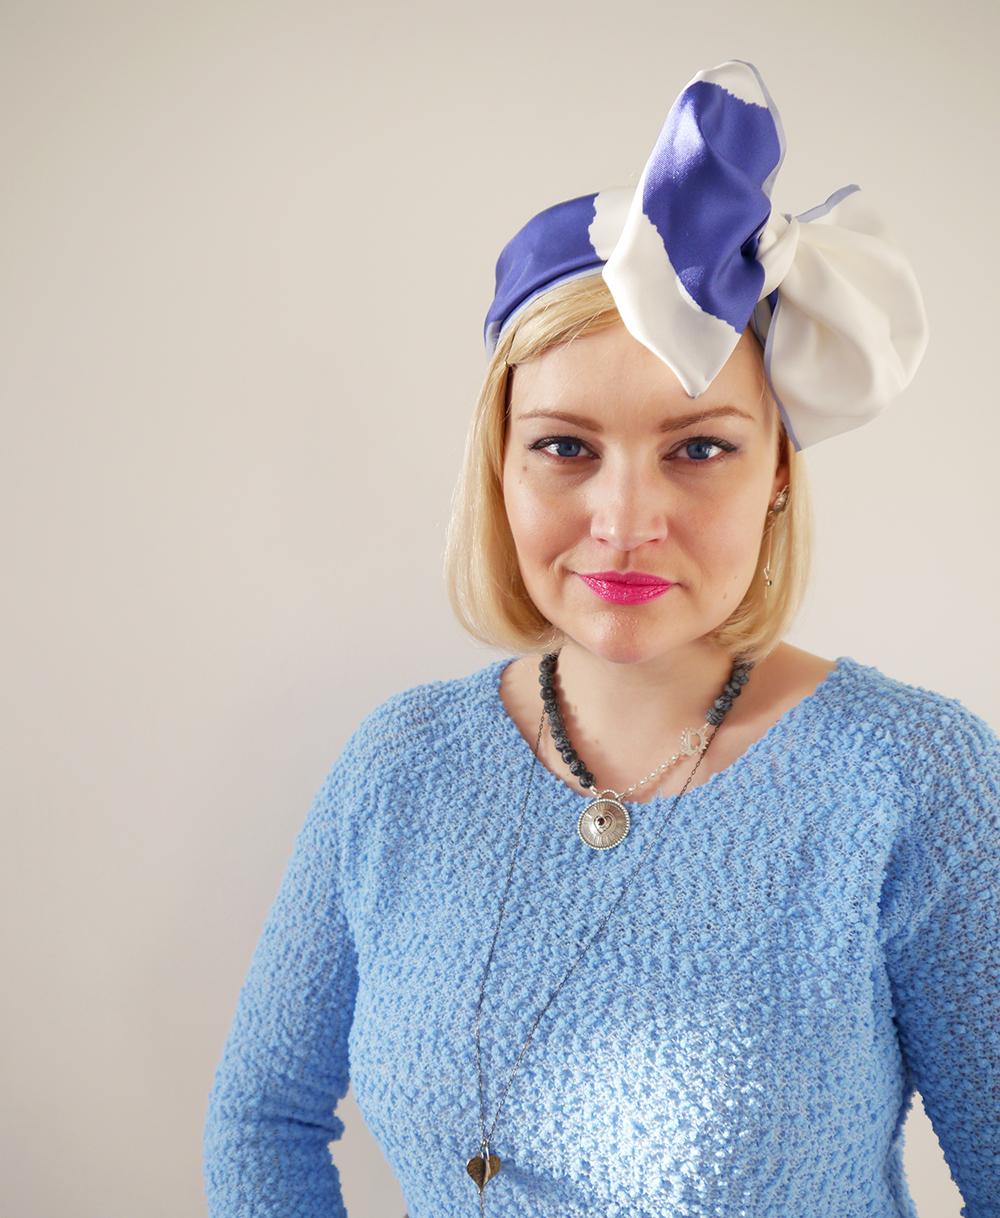 Alice in Wonderland, Karen Smith Jewellery, style inspiration, how to tie scarf in different ways, Cleo Ferin Mercury panda scarf, Scottish blogger, steampunk